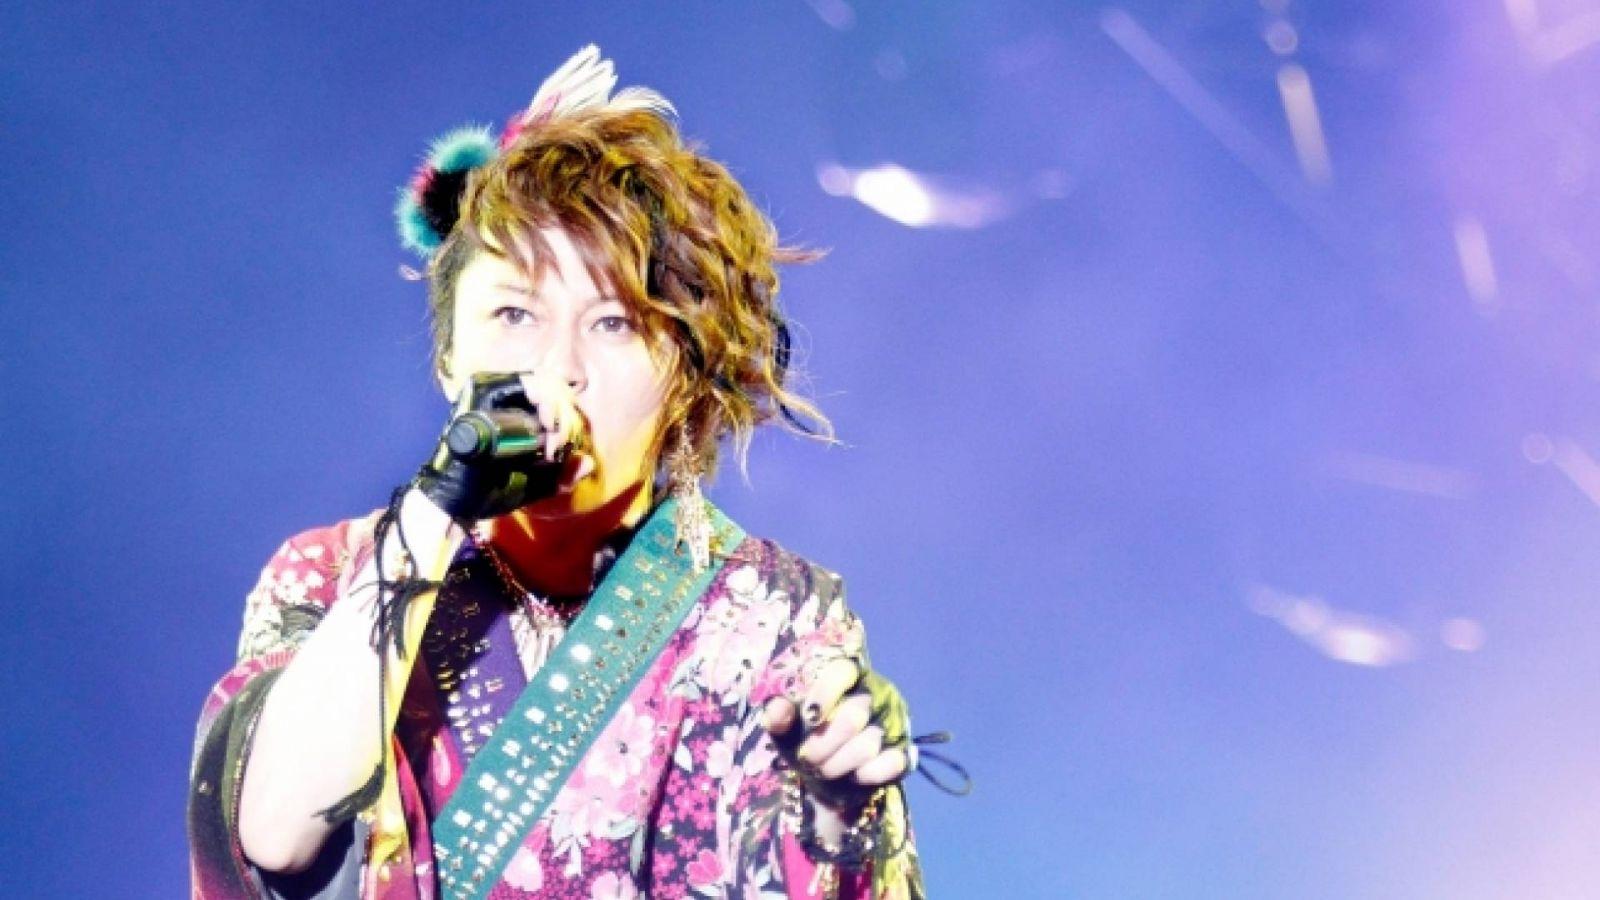 T.M.Revolution to Perform at Otakon 2013 © Sony Music Entertainment (Japan) Inc.